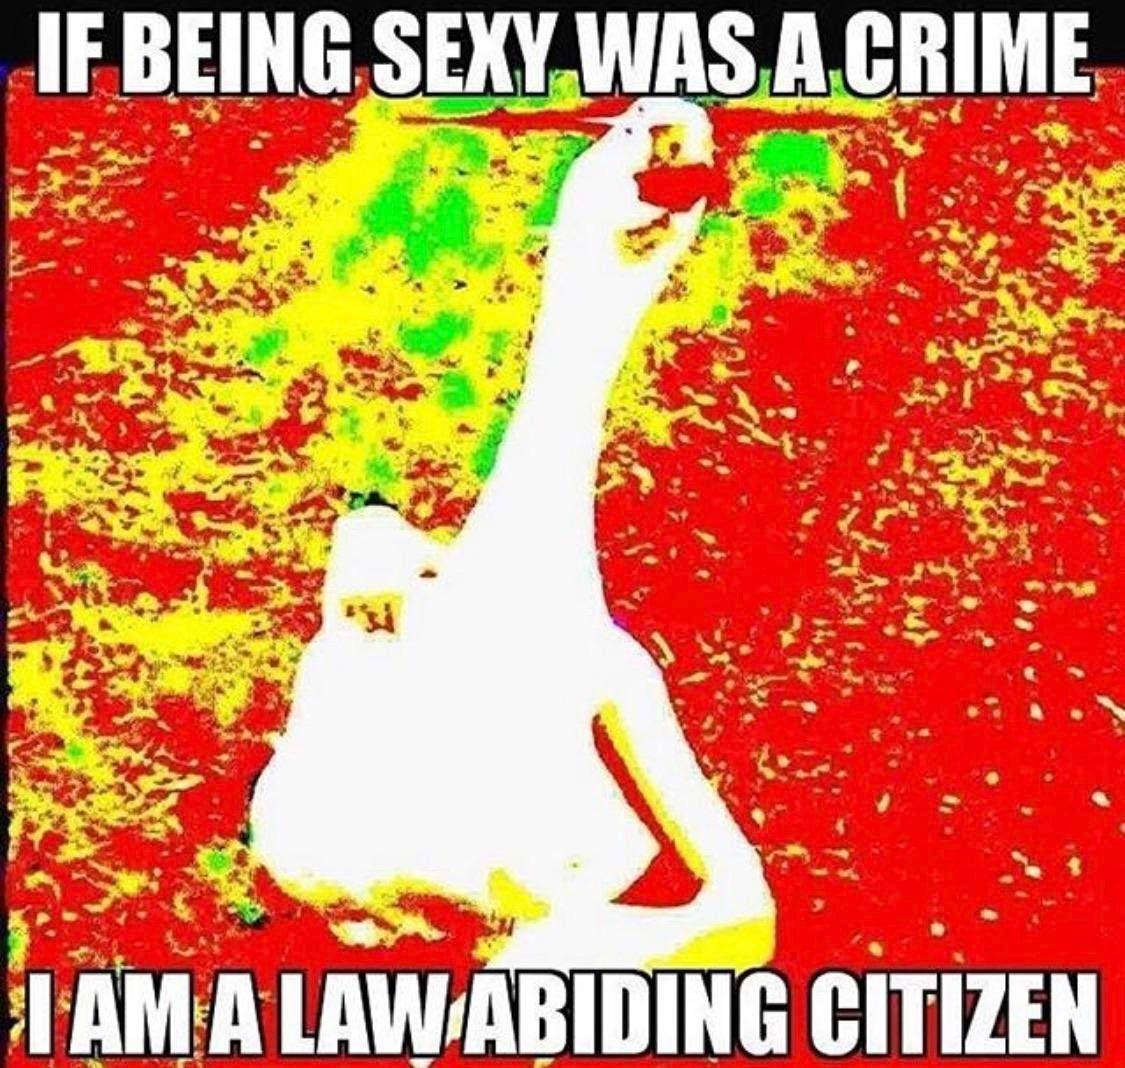 I'm innocent